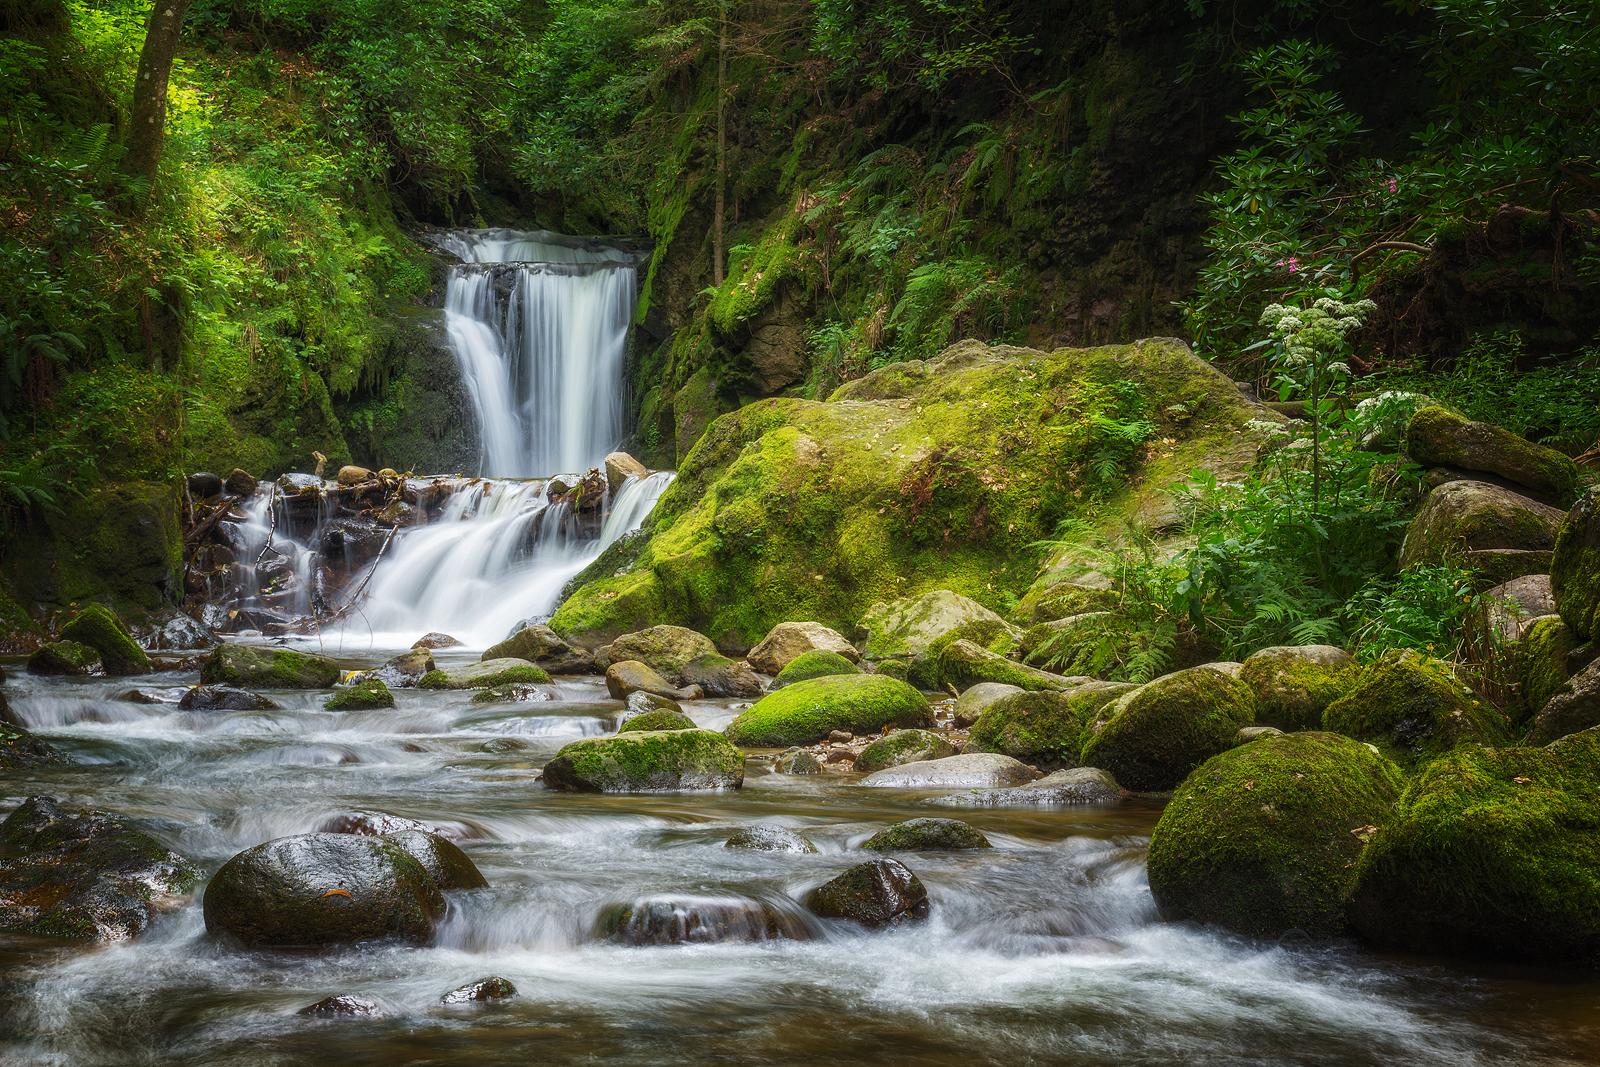 Geroldsauer Waterfall, Germany